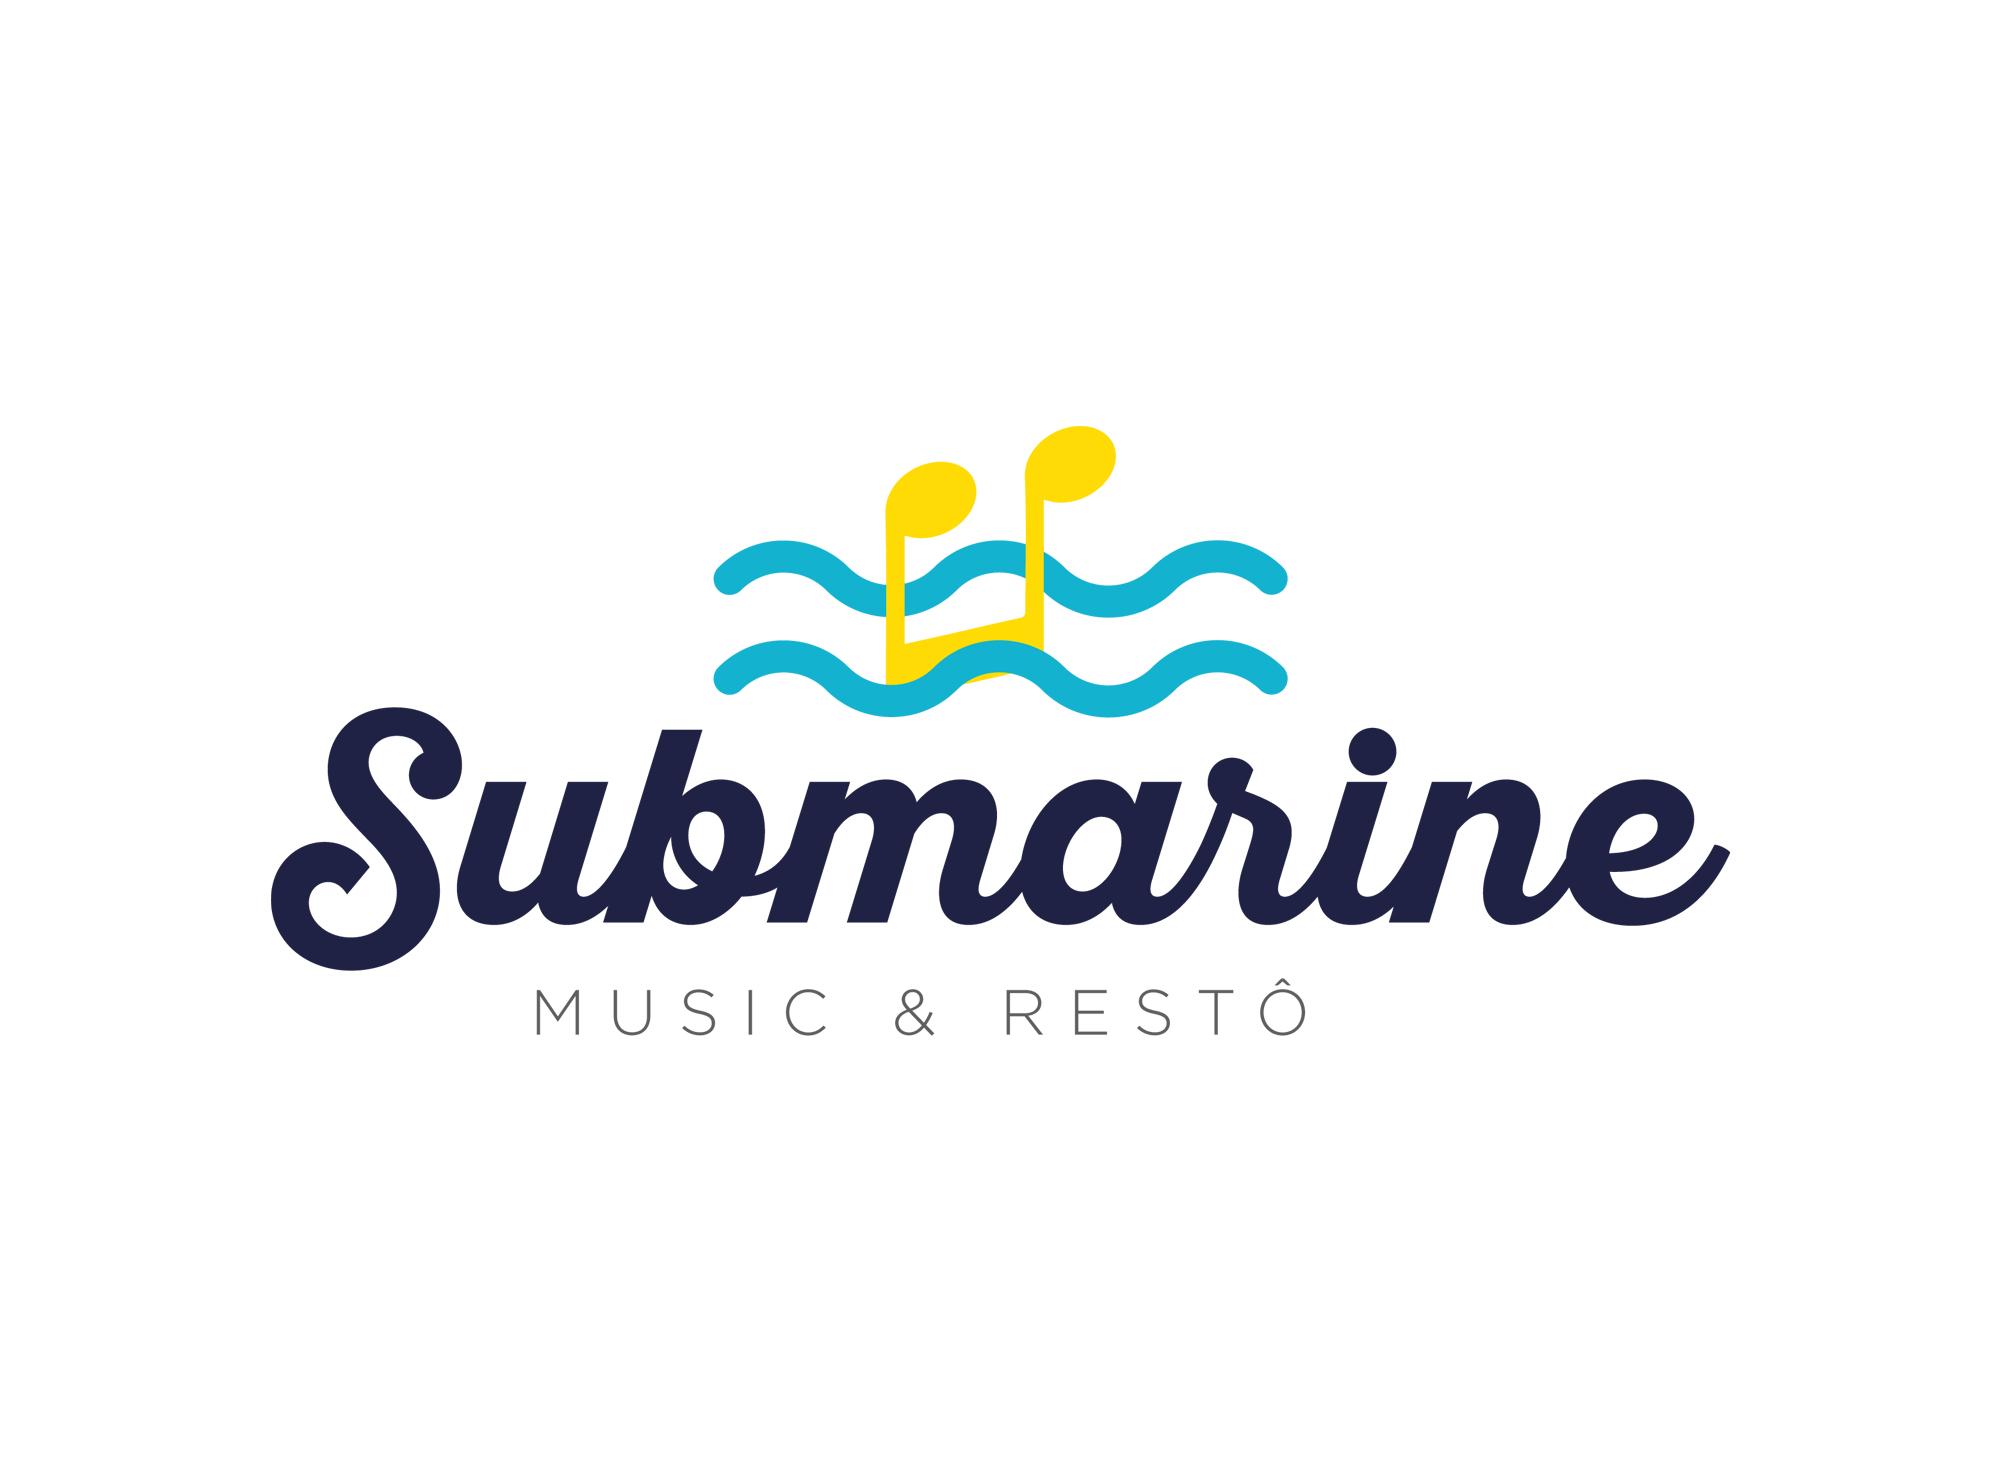 submarine-music-resto-cliente-agencia-diretriz-digital-marketing-fortaleza